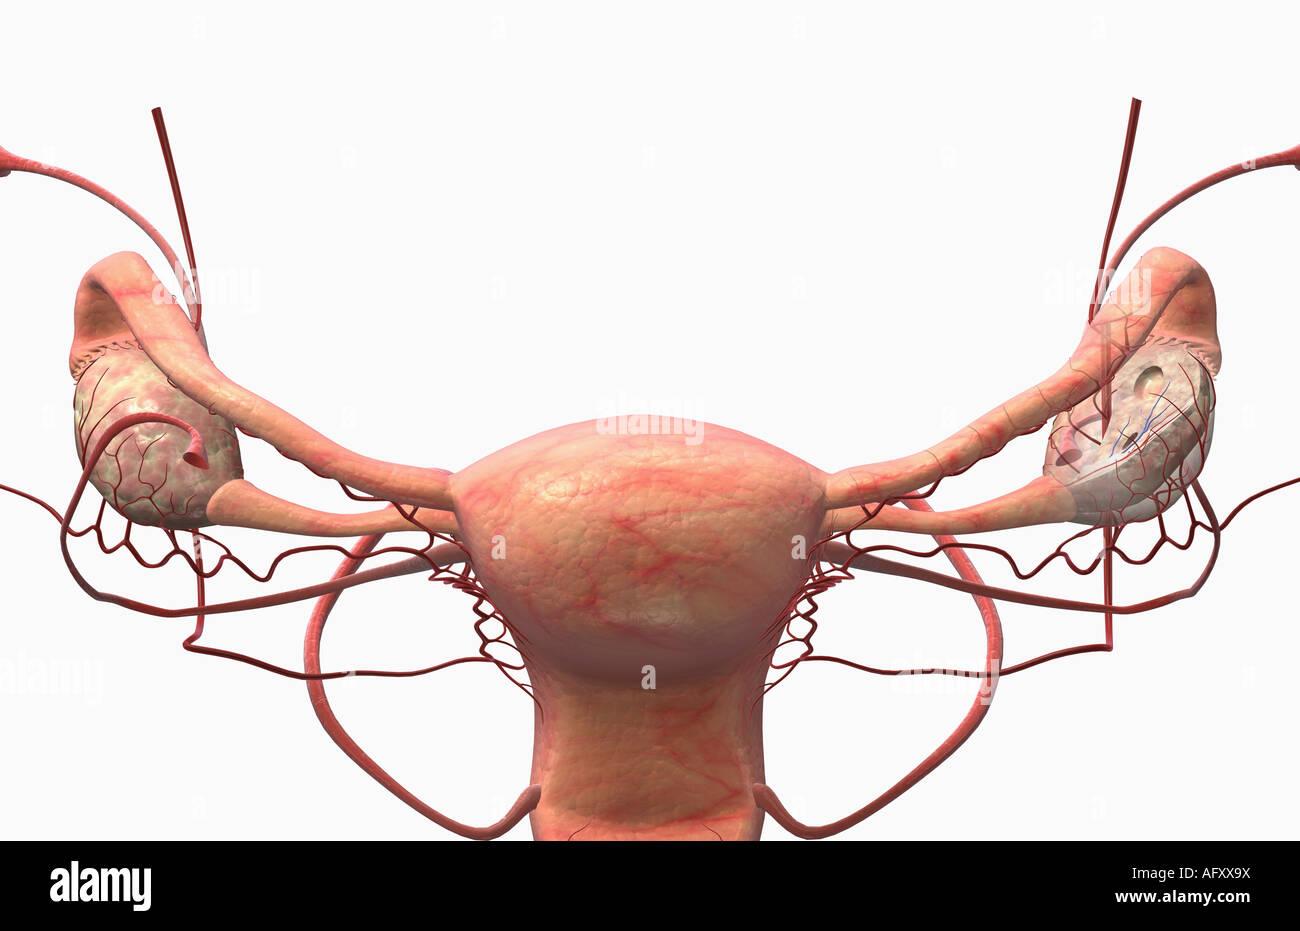 Uterosacral Ligament Stock Photos Uterosacral Ligament Stock